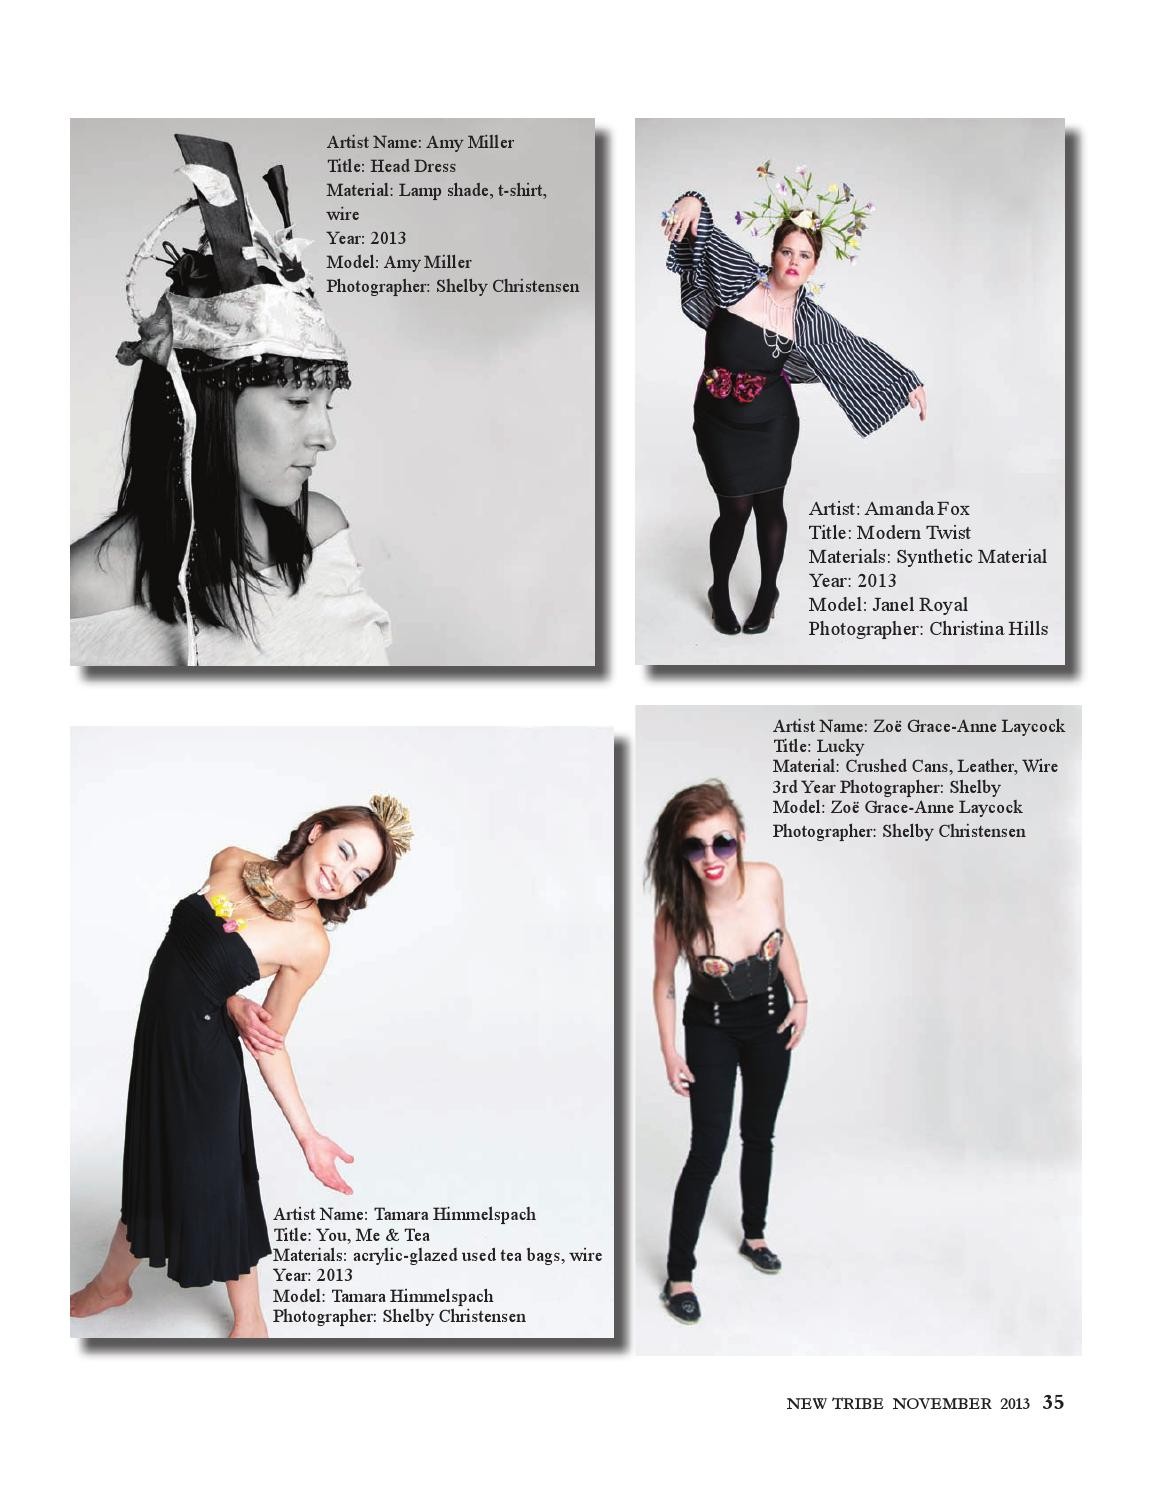 Amy Miller Photography 2013 nov new tribeonline by new tribe magazine - issuu